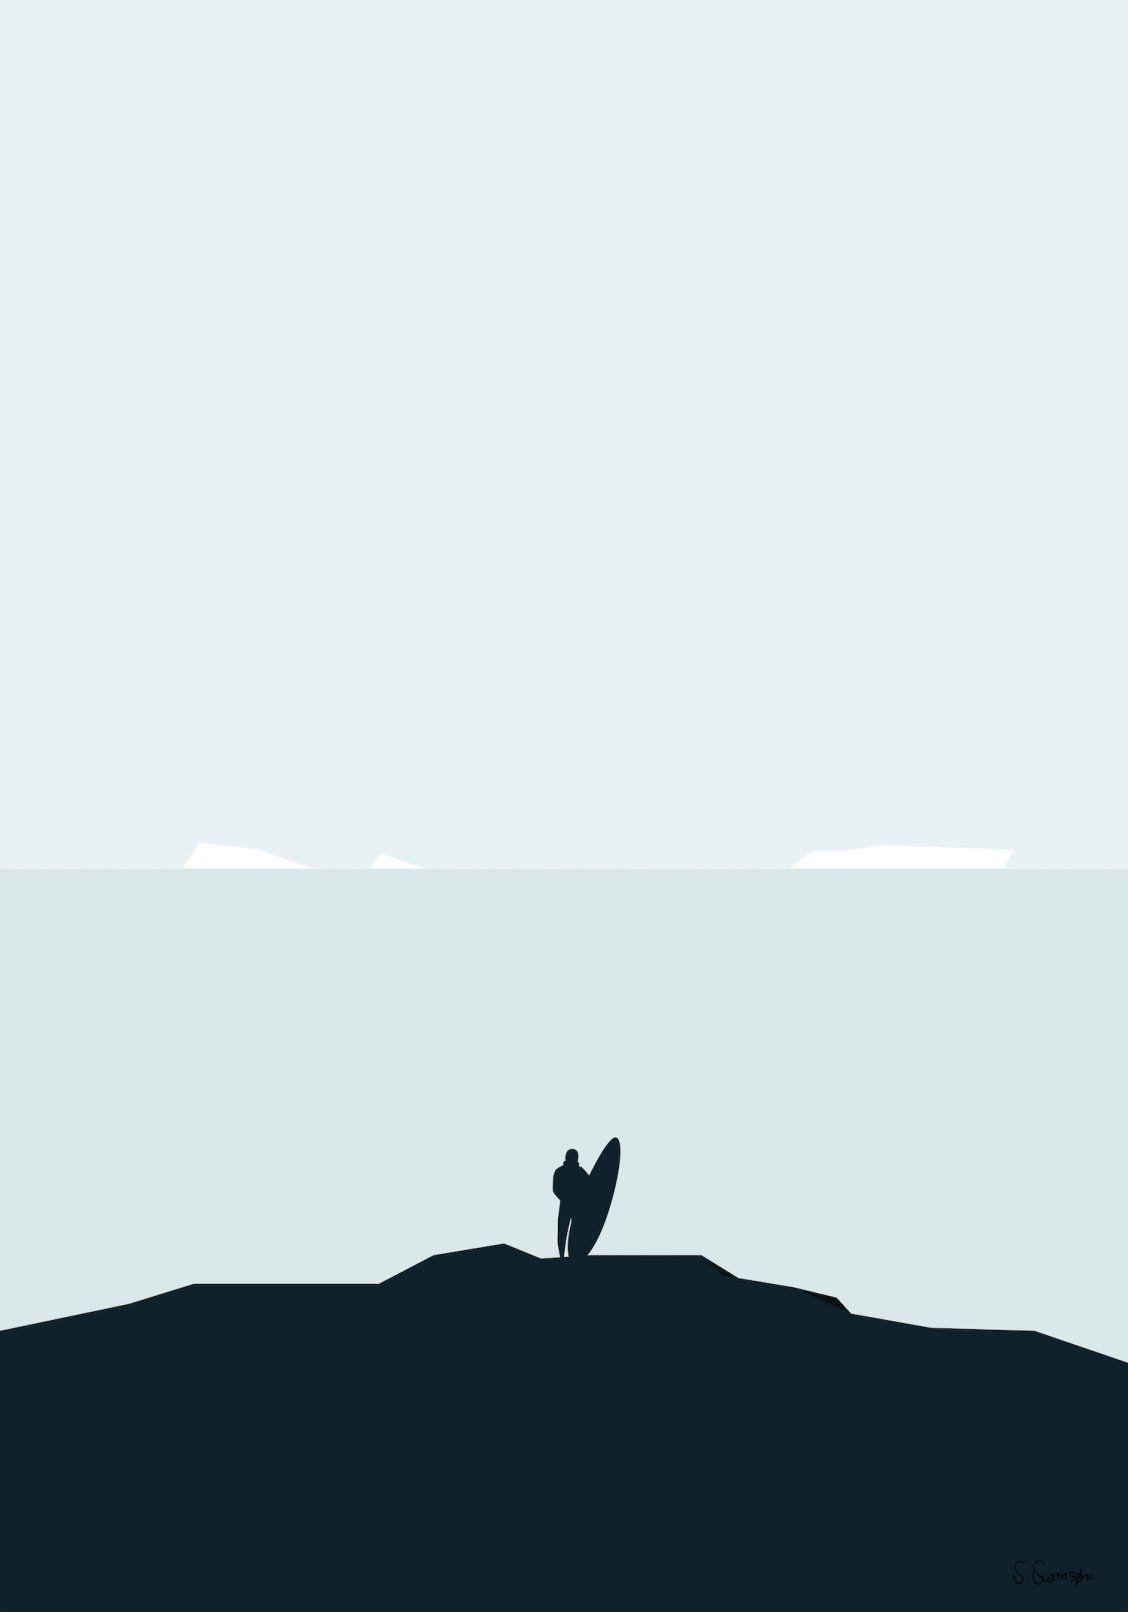 """SURFE I ISEN"" Art Print by Swen Swensøn on Society6 | Society6 thumbnail"